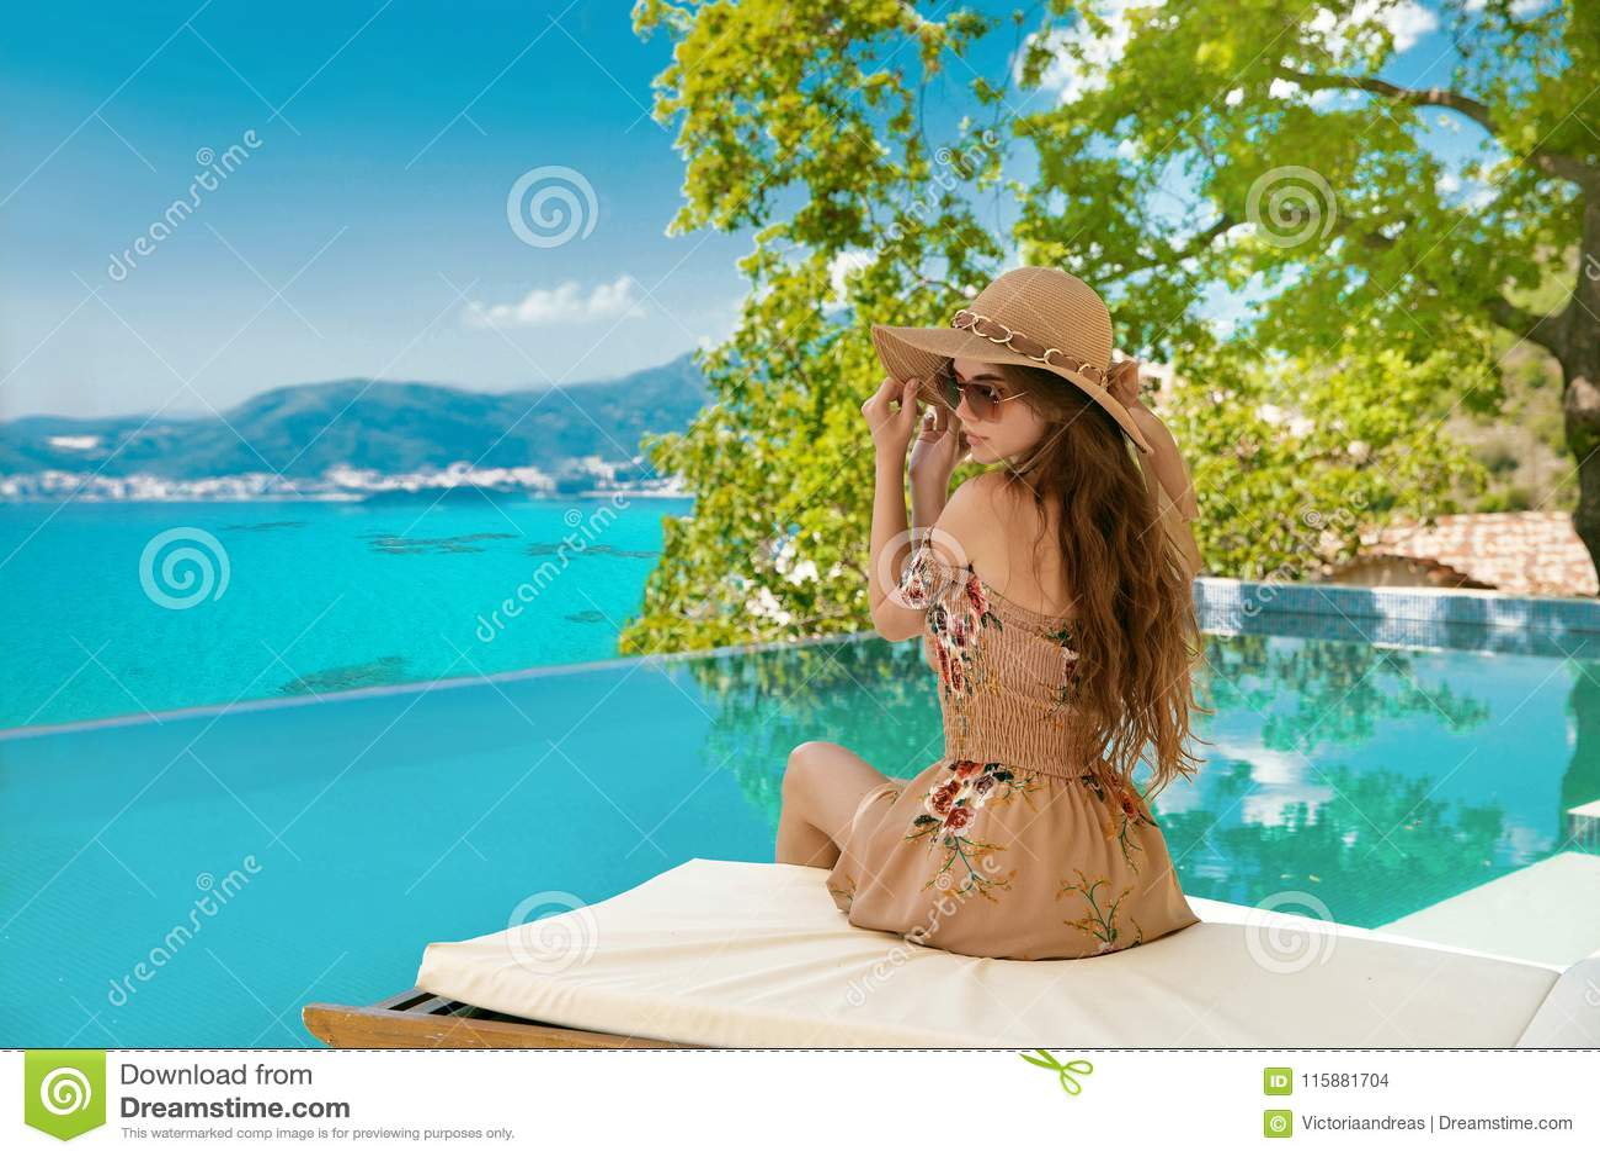 Krasnodar διακοπές θερινών εδαφών katya Όμορφη γυναίκα στο καπέλο παραλιών που απολαμβάνει τη θέα θάλασσας